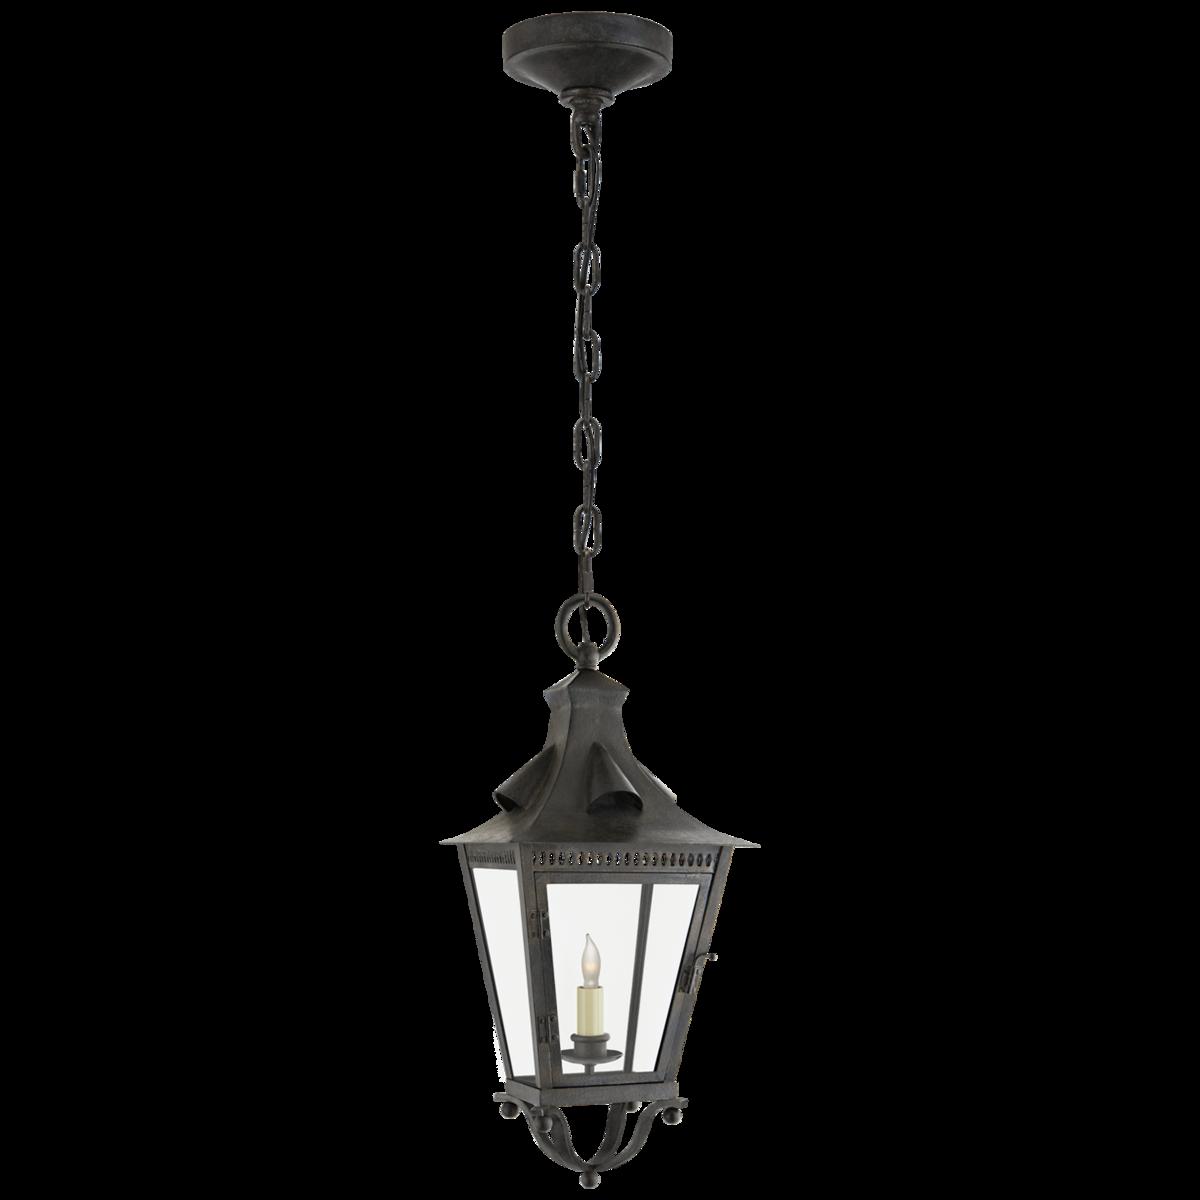 Orleans Small Hanging Lantern